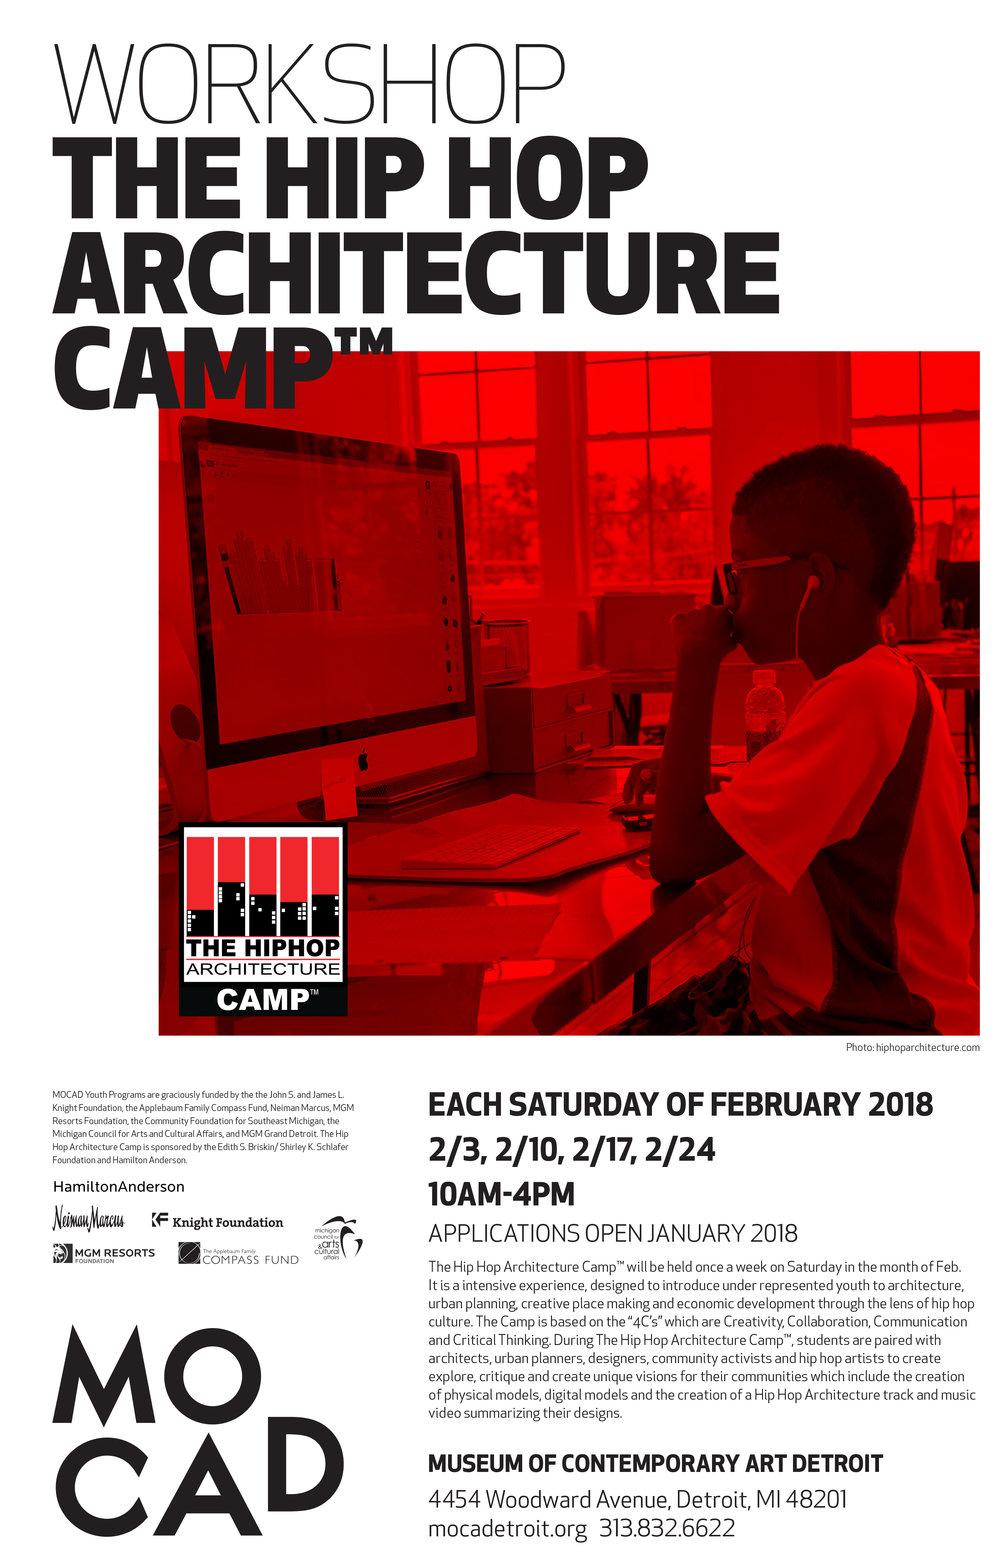 HIP HOP ARCHITECTURE CAMP - MOCAD